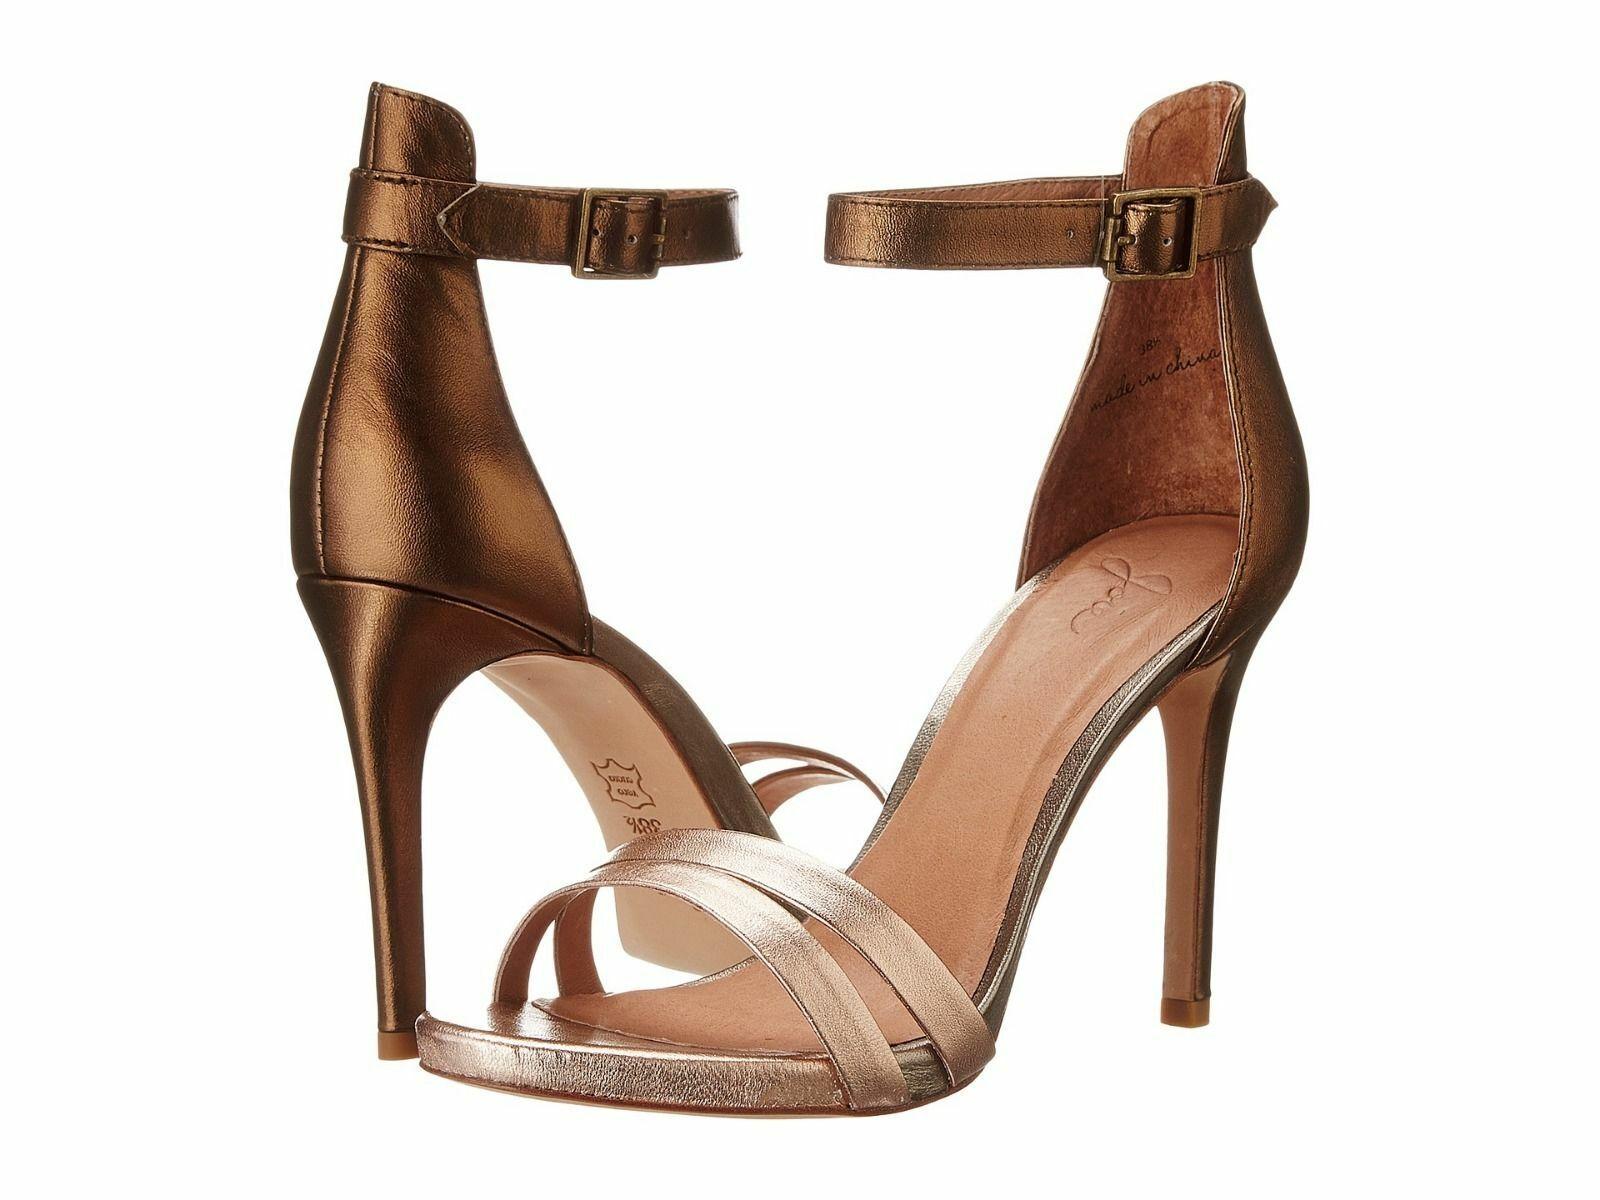 Joie oro Jenna  Metallic Leather Open -toe Sandals, sz Eur 41, US 11, NEW  più sconto